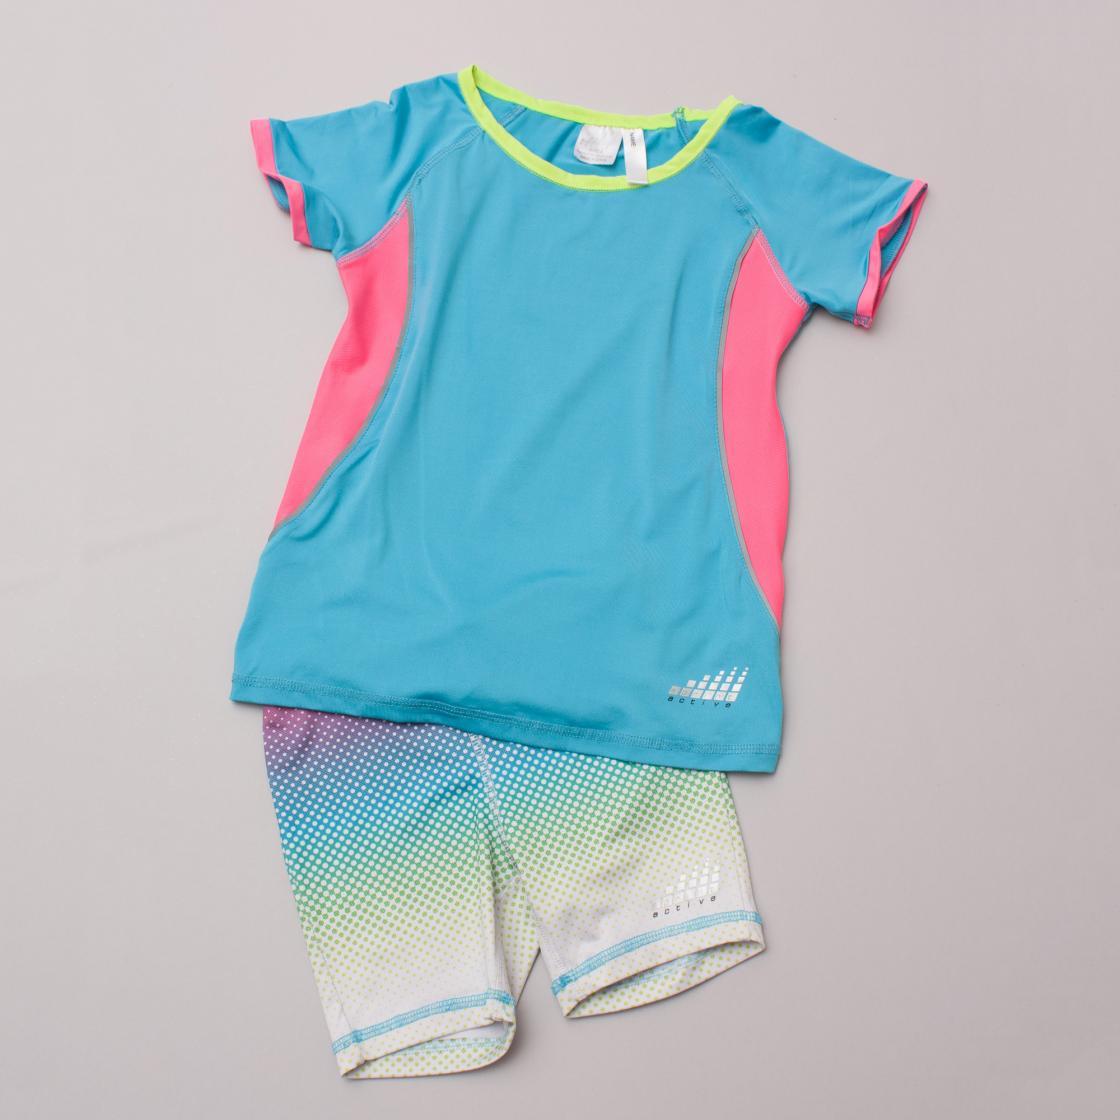 Sprint Active Top & Shorts Set